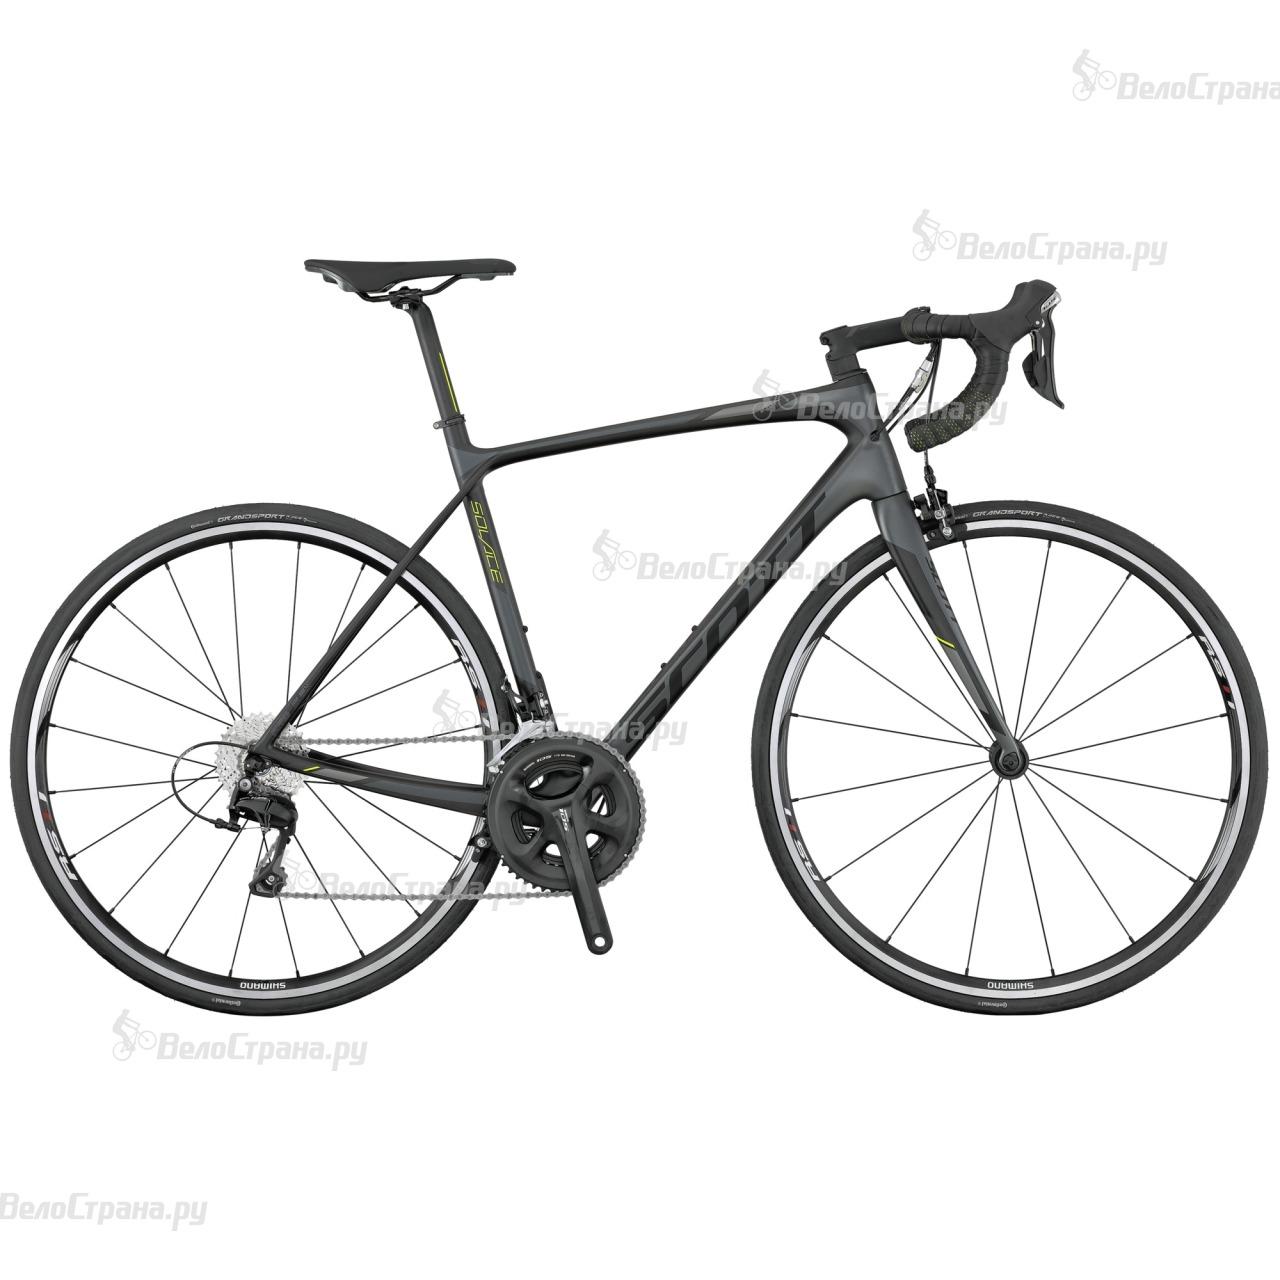 Велосипед Scott Solace 20 (2017) велосипед scott contessa solace 15 compact 2015